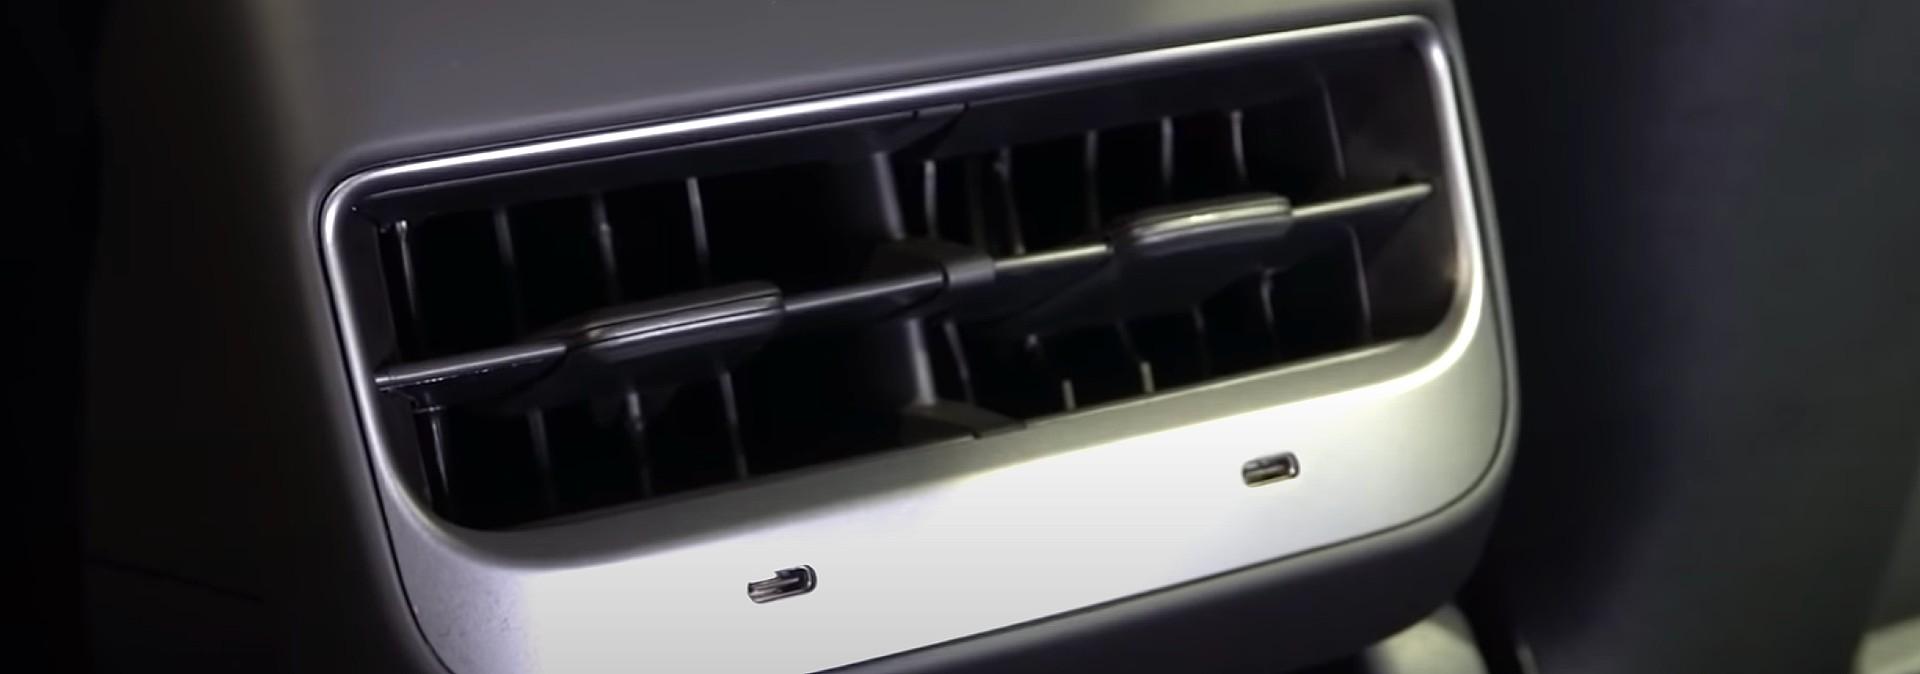 tesla-model-3-refresh-usb-c-ports